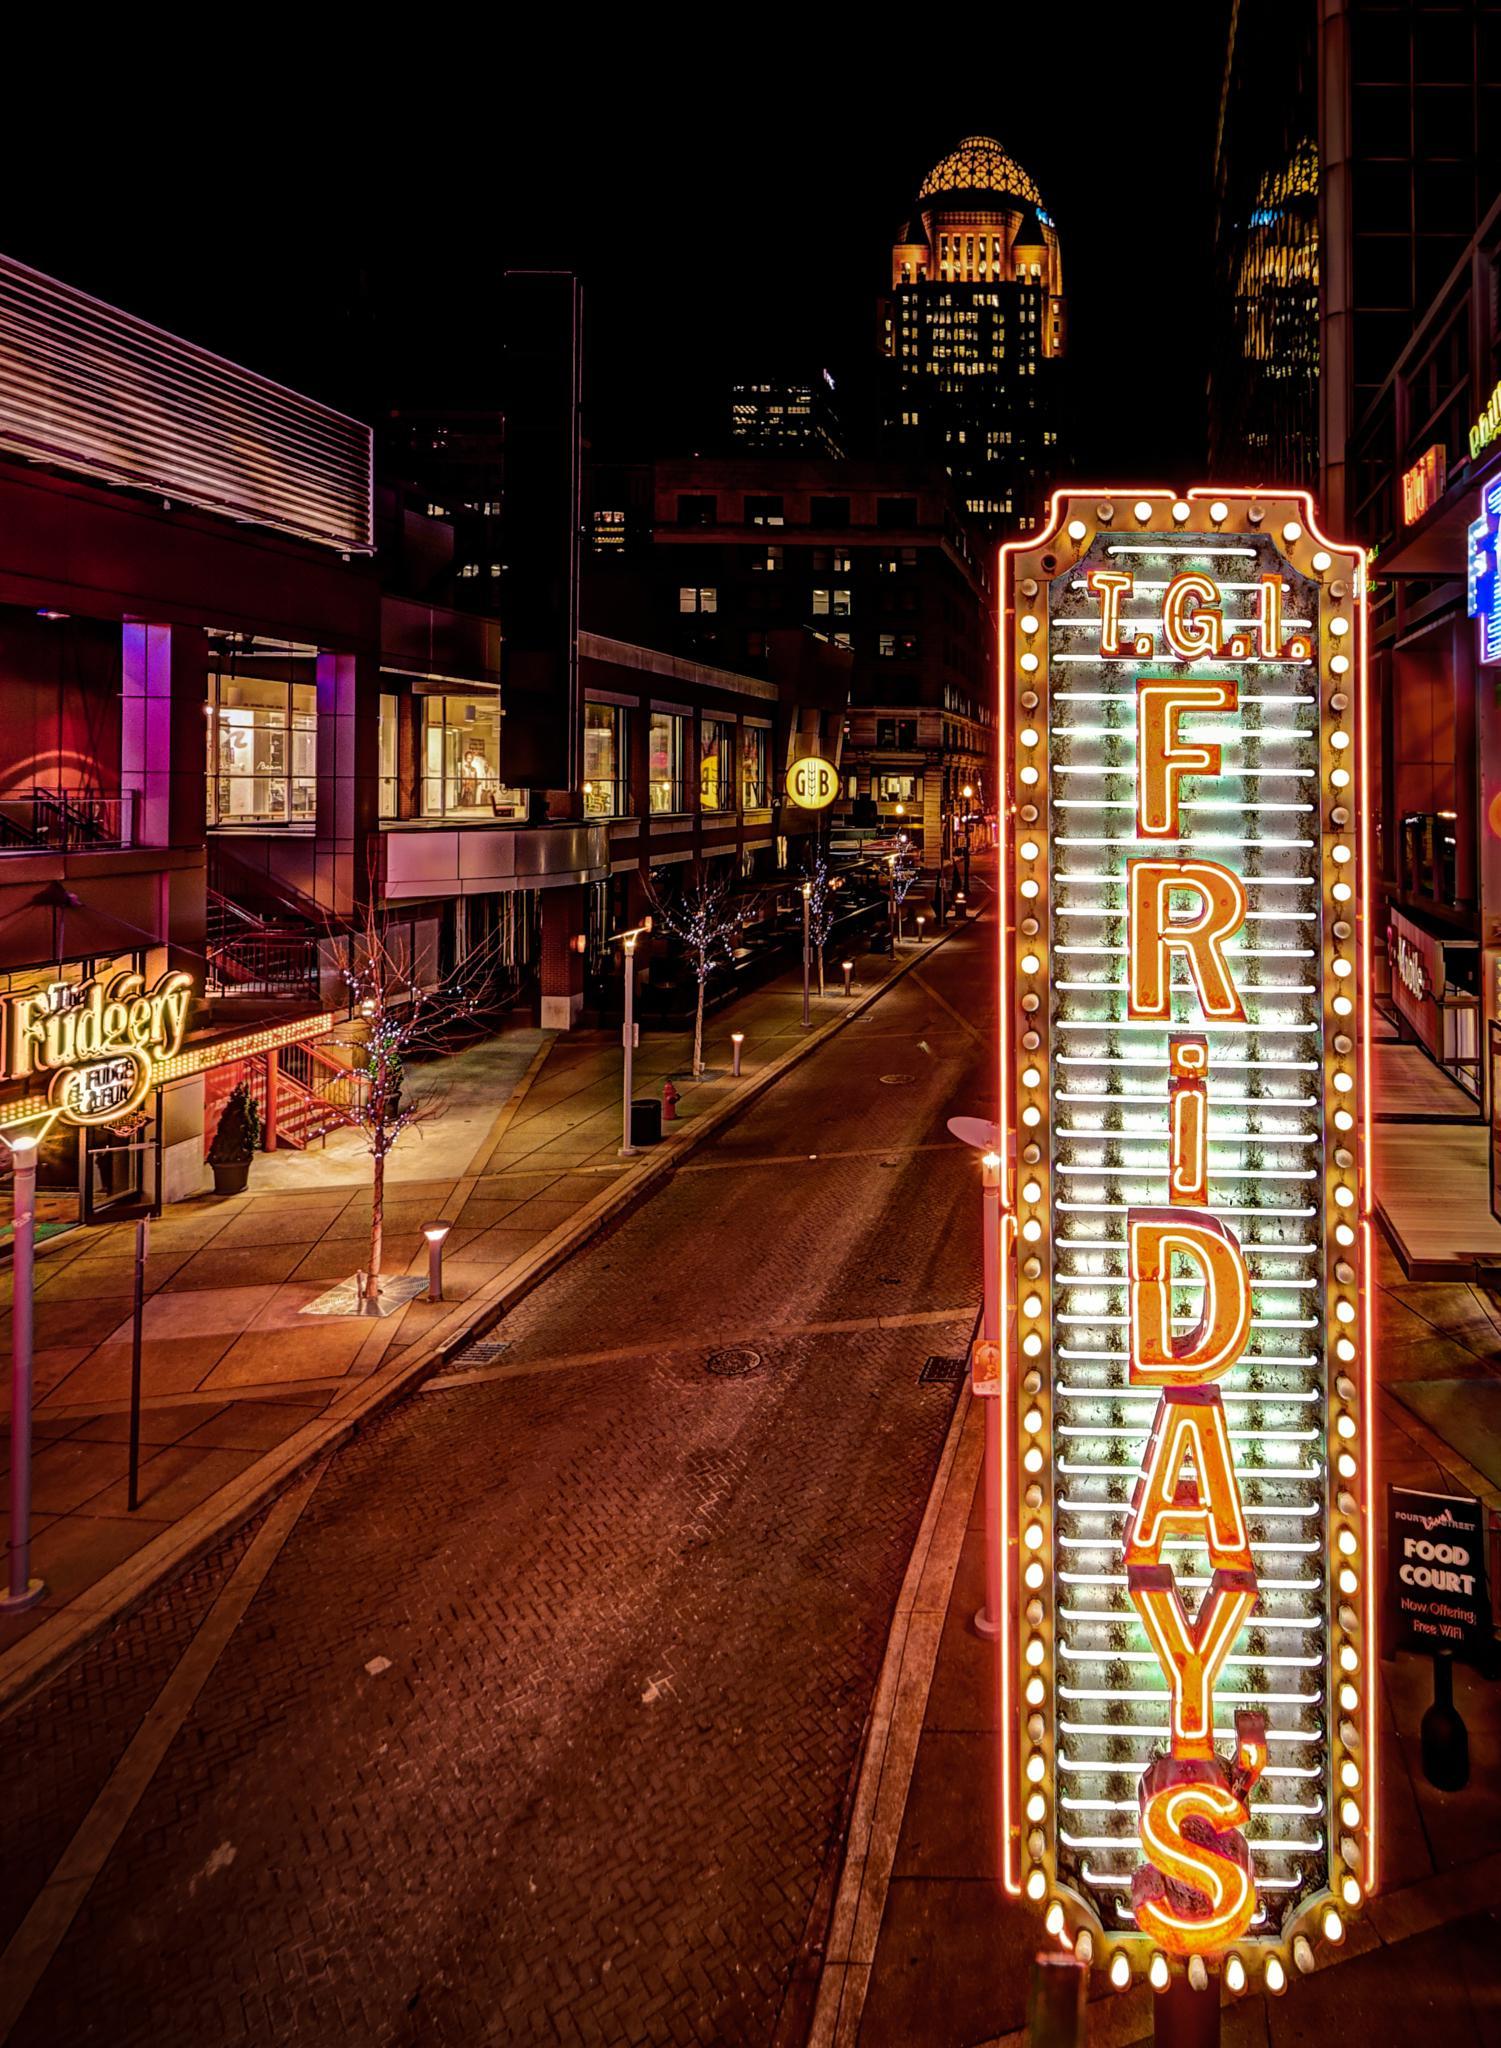 4th street live restaurants by Emmanuel Ruiz